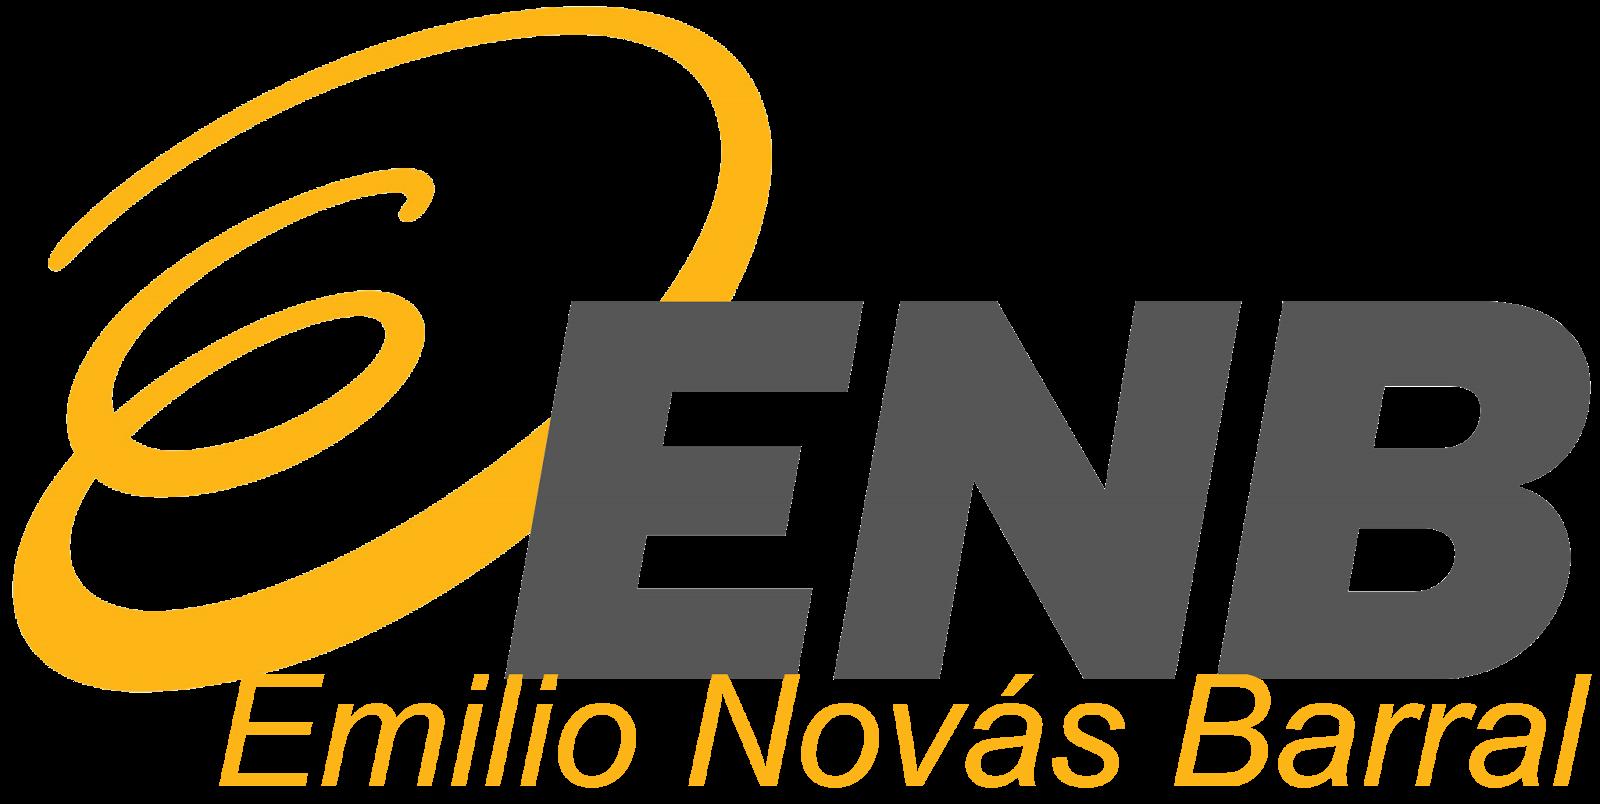 Emilio Novás Barral